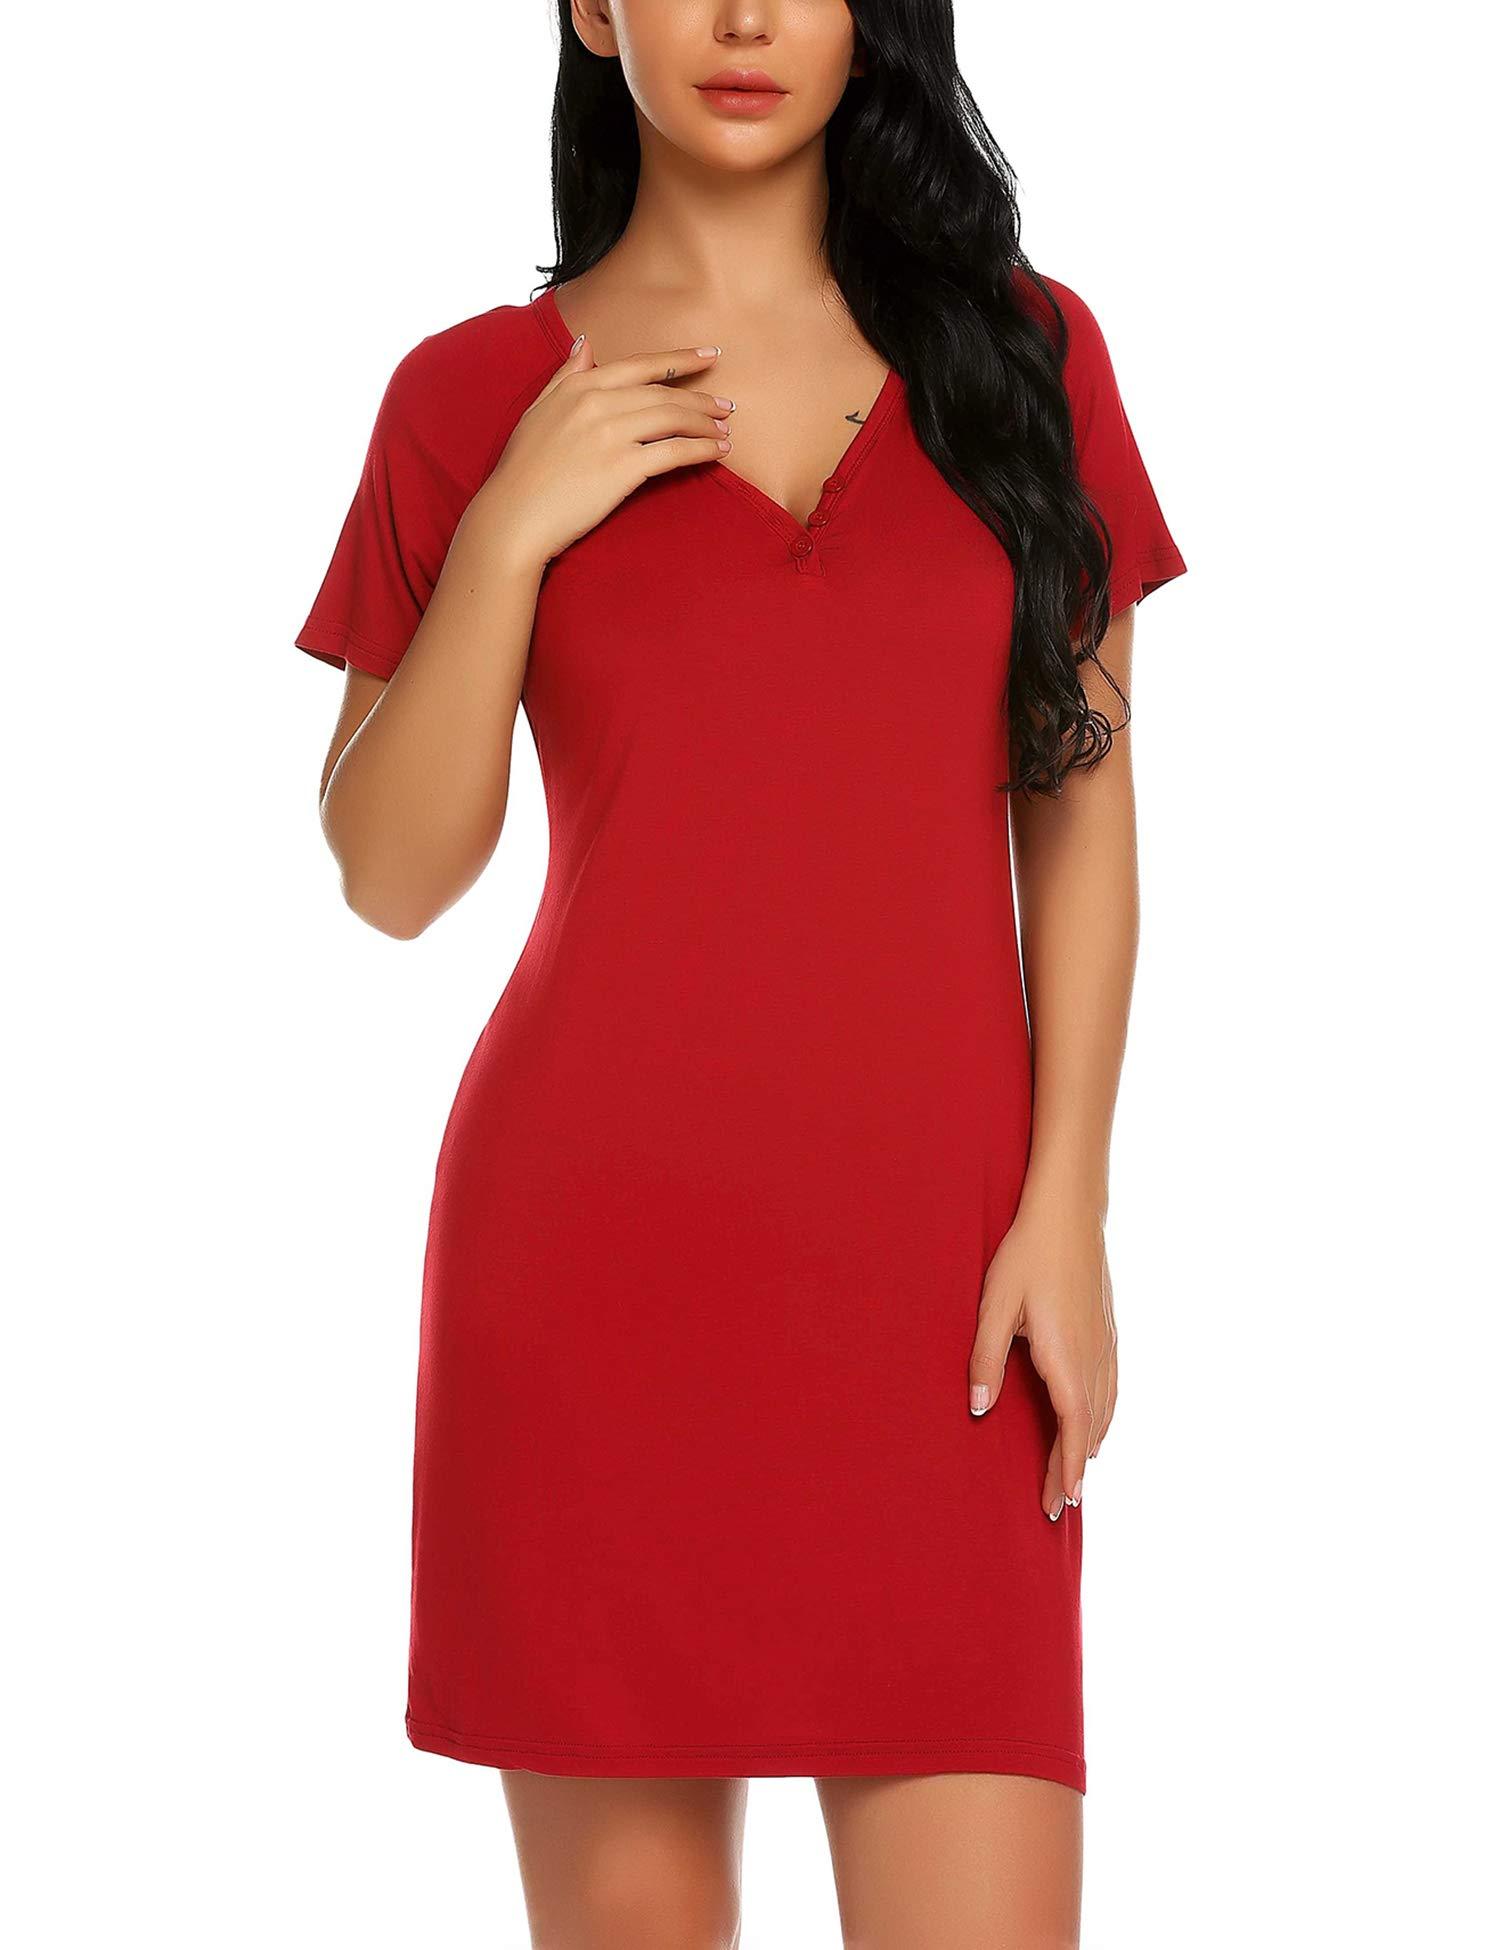 Chomoleza Women's Short Sleeve Sleepshirt V Neck Nightshirt Nightgown Sleepwear